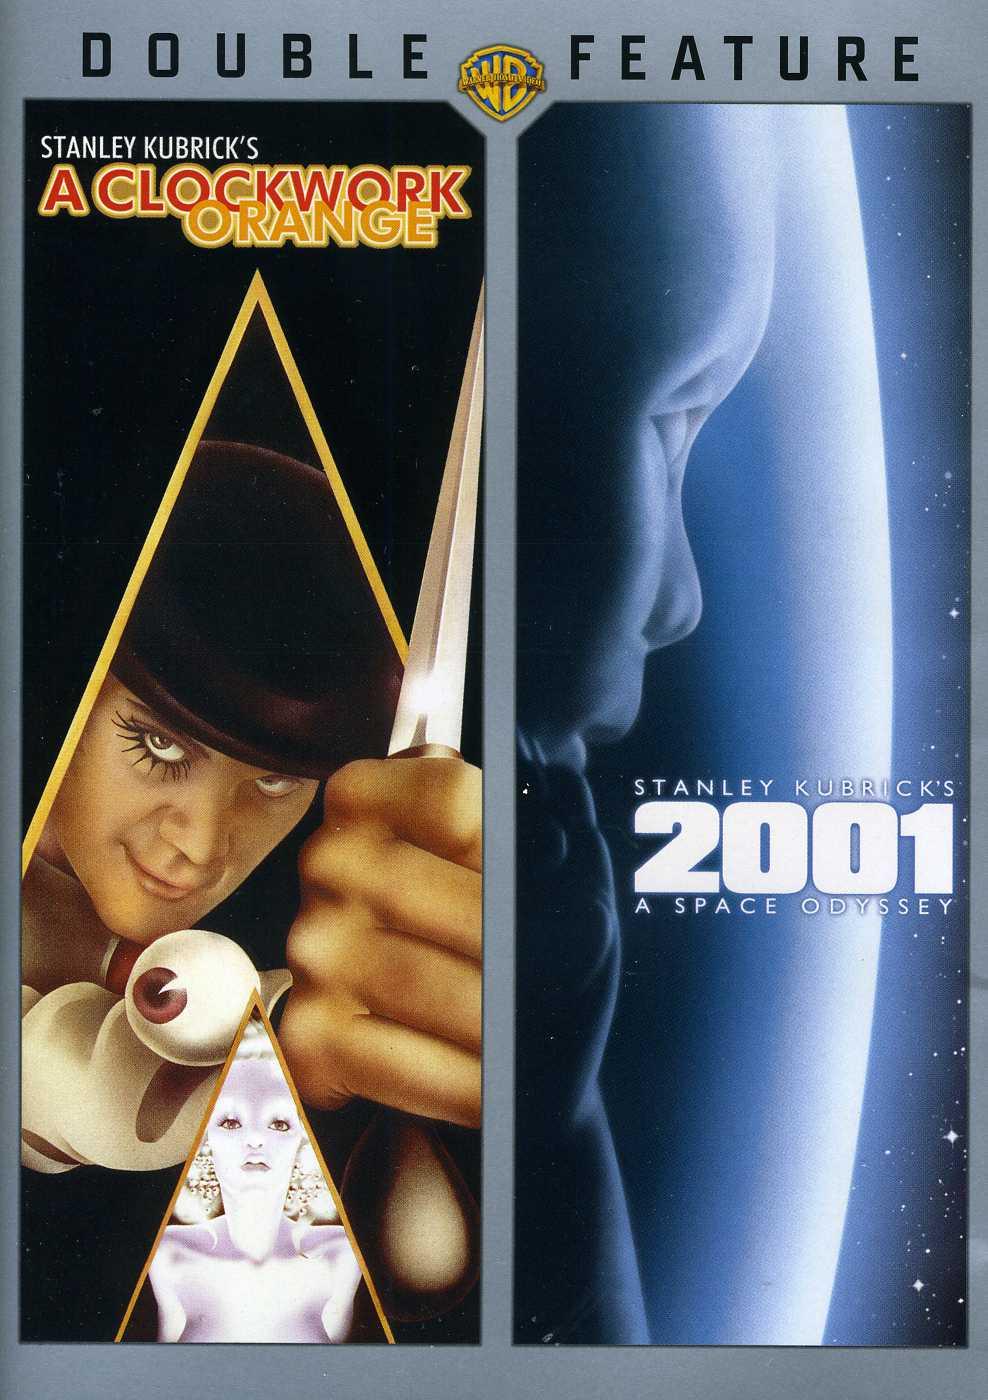 2001: A Space Odyssey/Clockwork Orange (DVD)